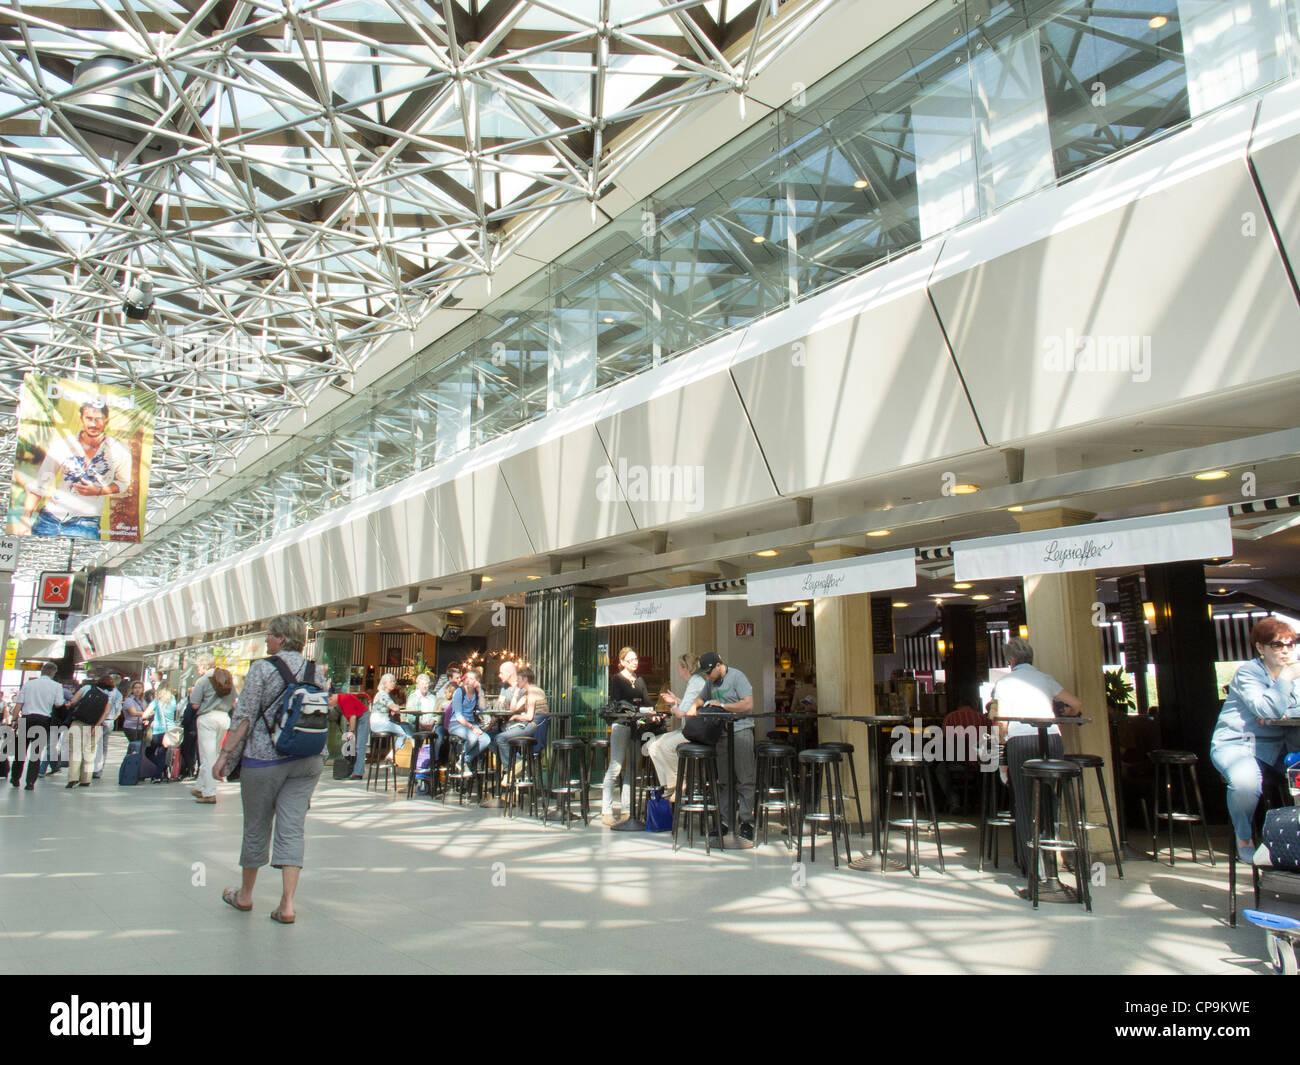 Berlin tegel airport arrivals and departures area stock for Flughafen tegel